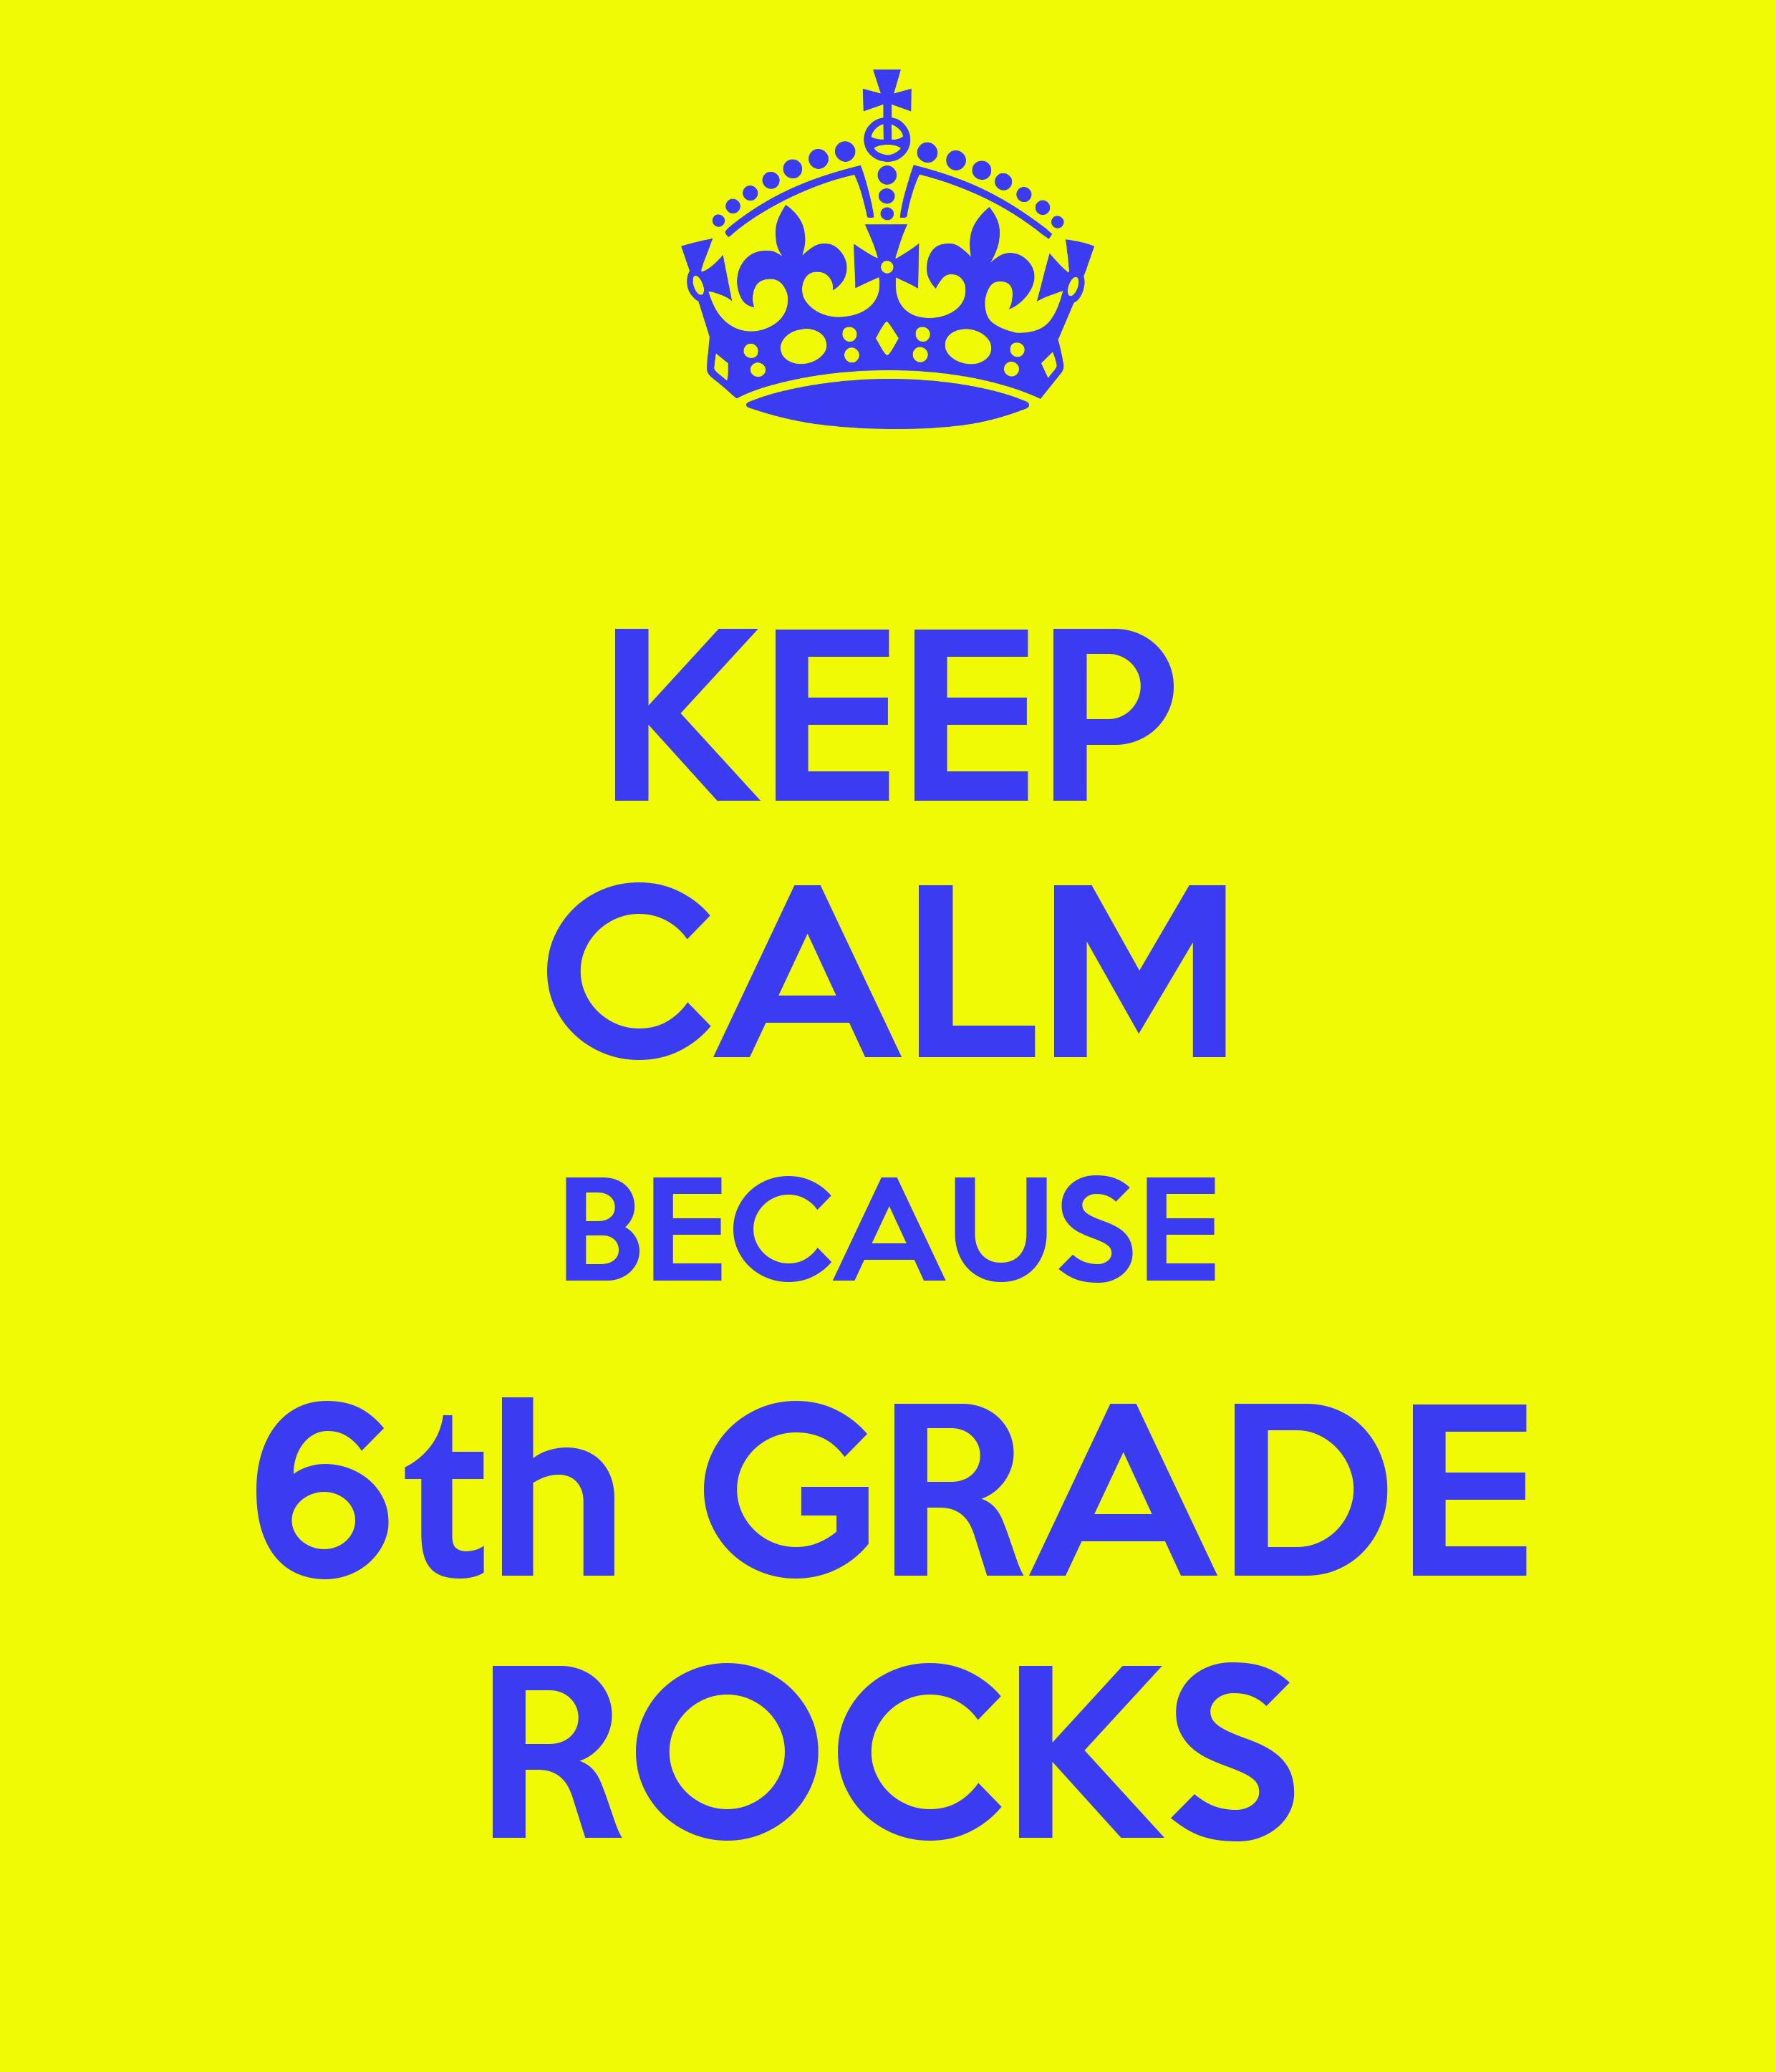 Free Sixth Grade Cliparts, Download Free Clip Art, Free ... |Sixth Grade Rocks